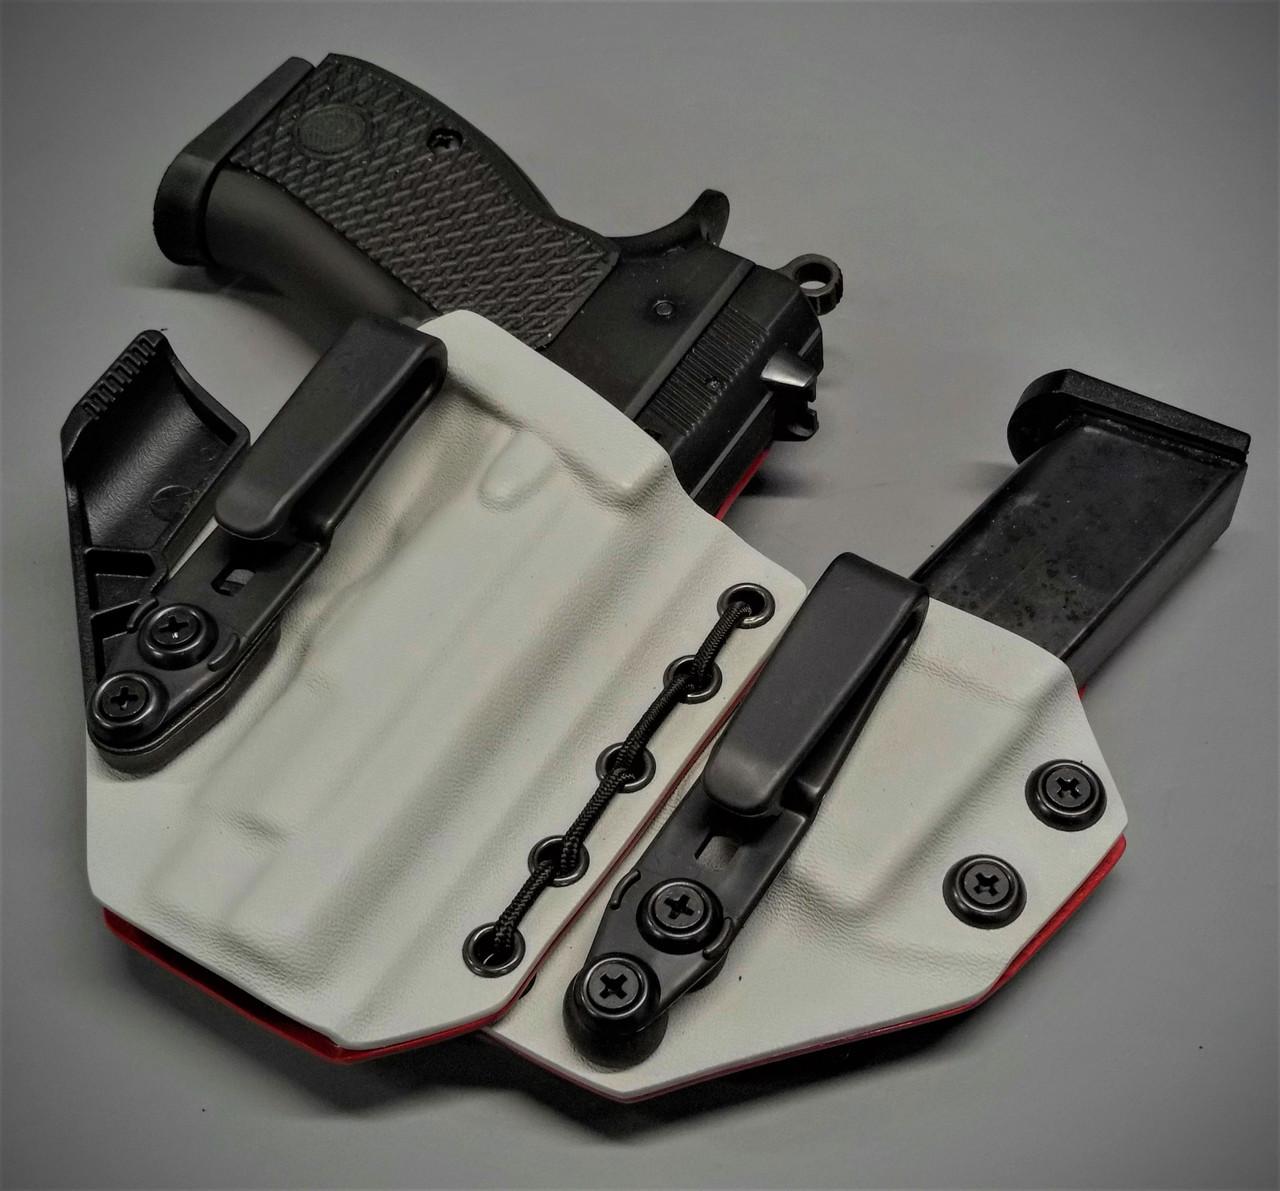 CZ 75 Compact Appendix Carry Rig